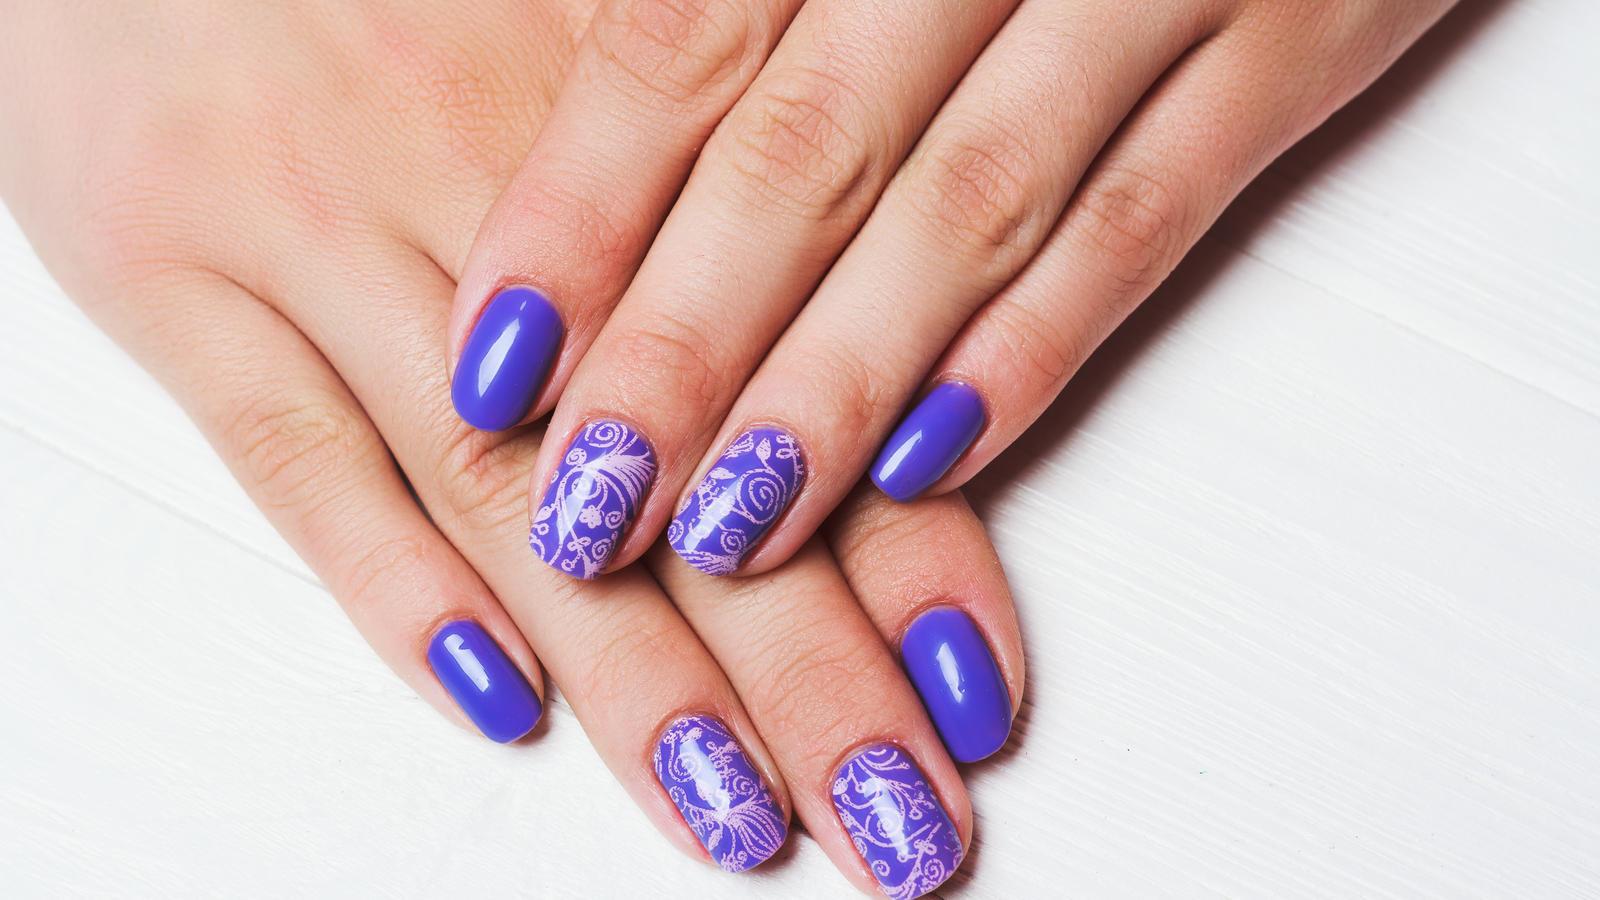 Stamping-Nails: Mit dem Nagelstempel zum perfekten Nageldesign